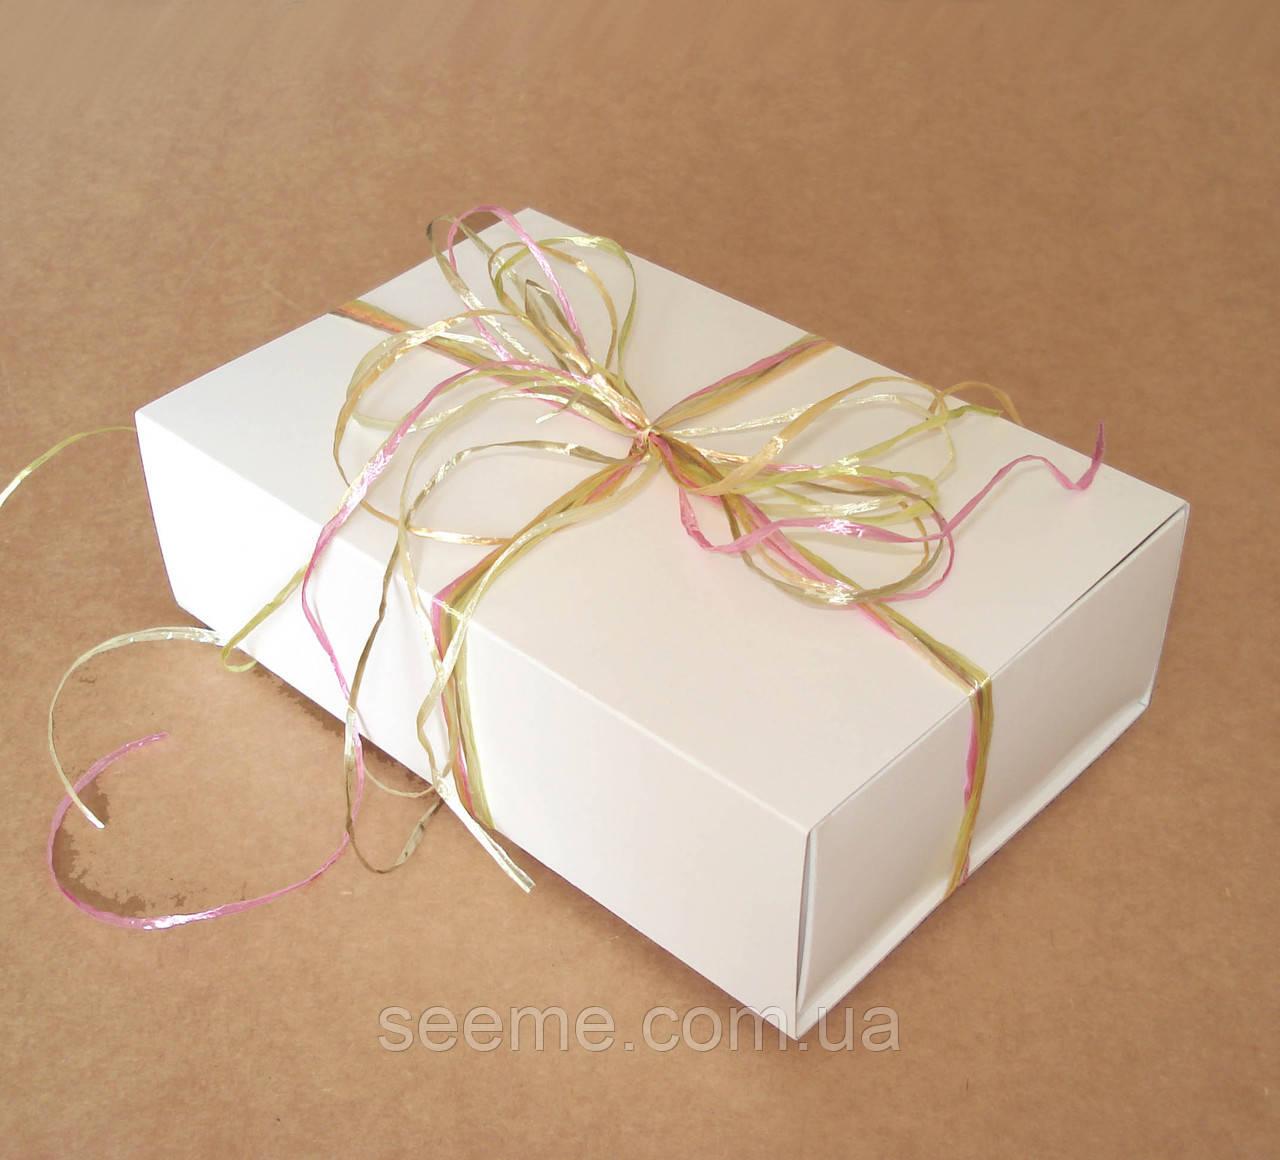 Коробка подарочная для 10-12 macarons 170х110х50 мм с вкладкой-разделителем